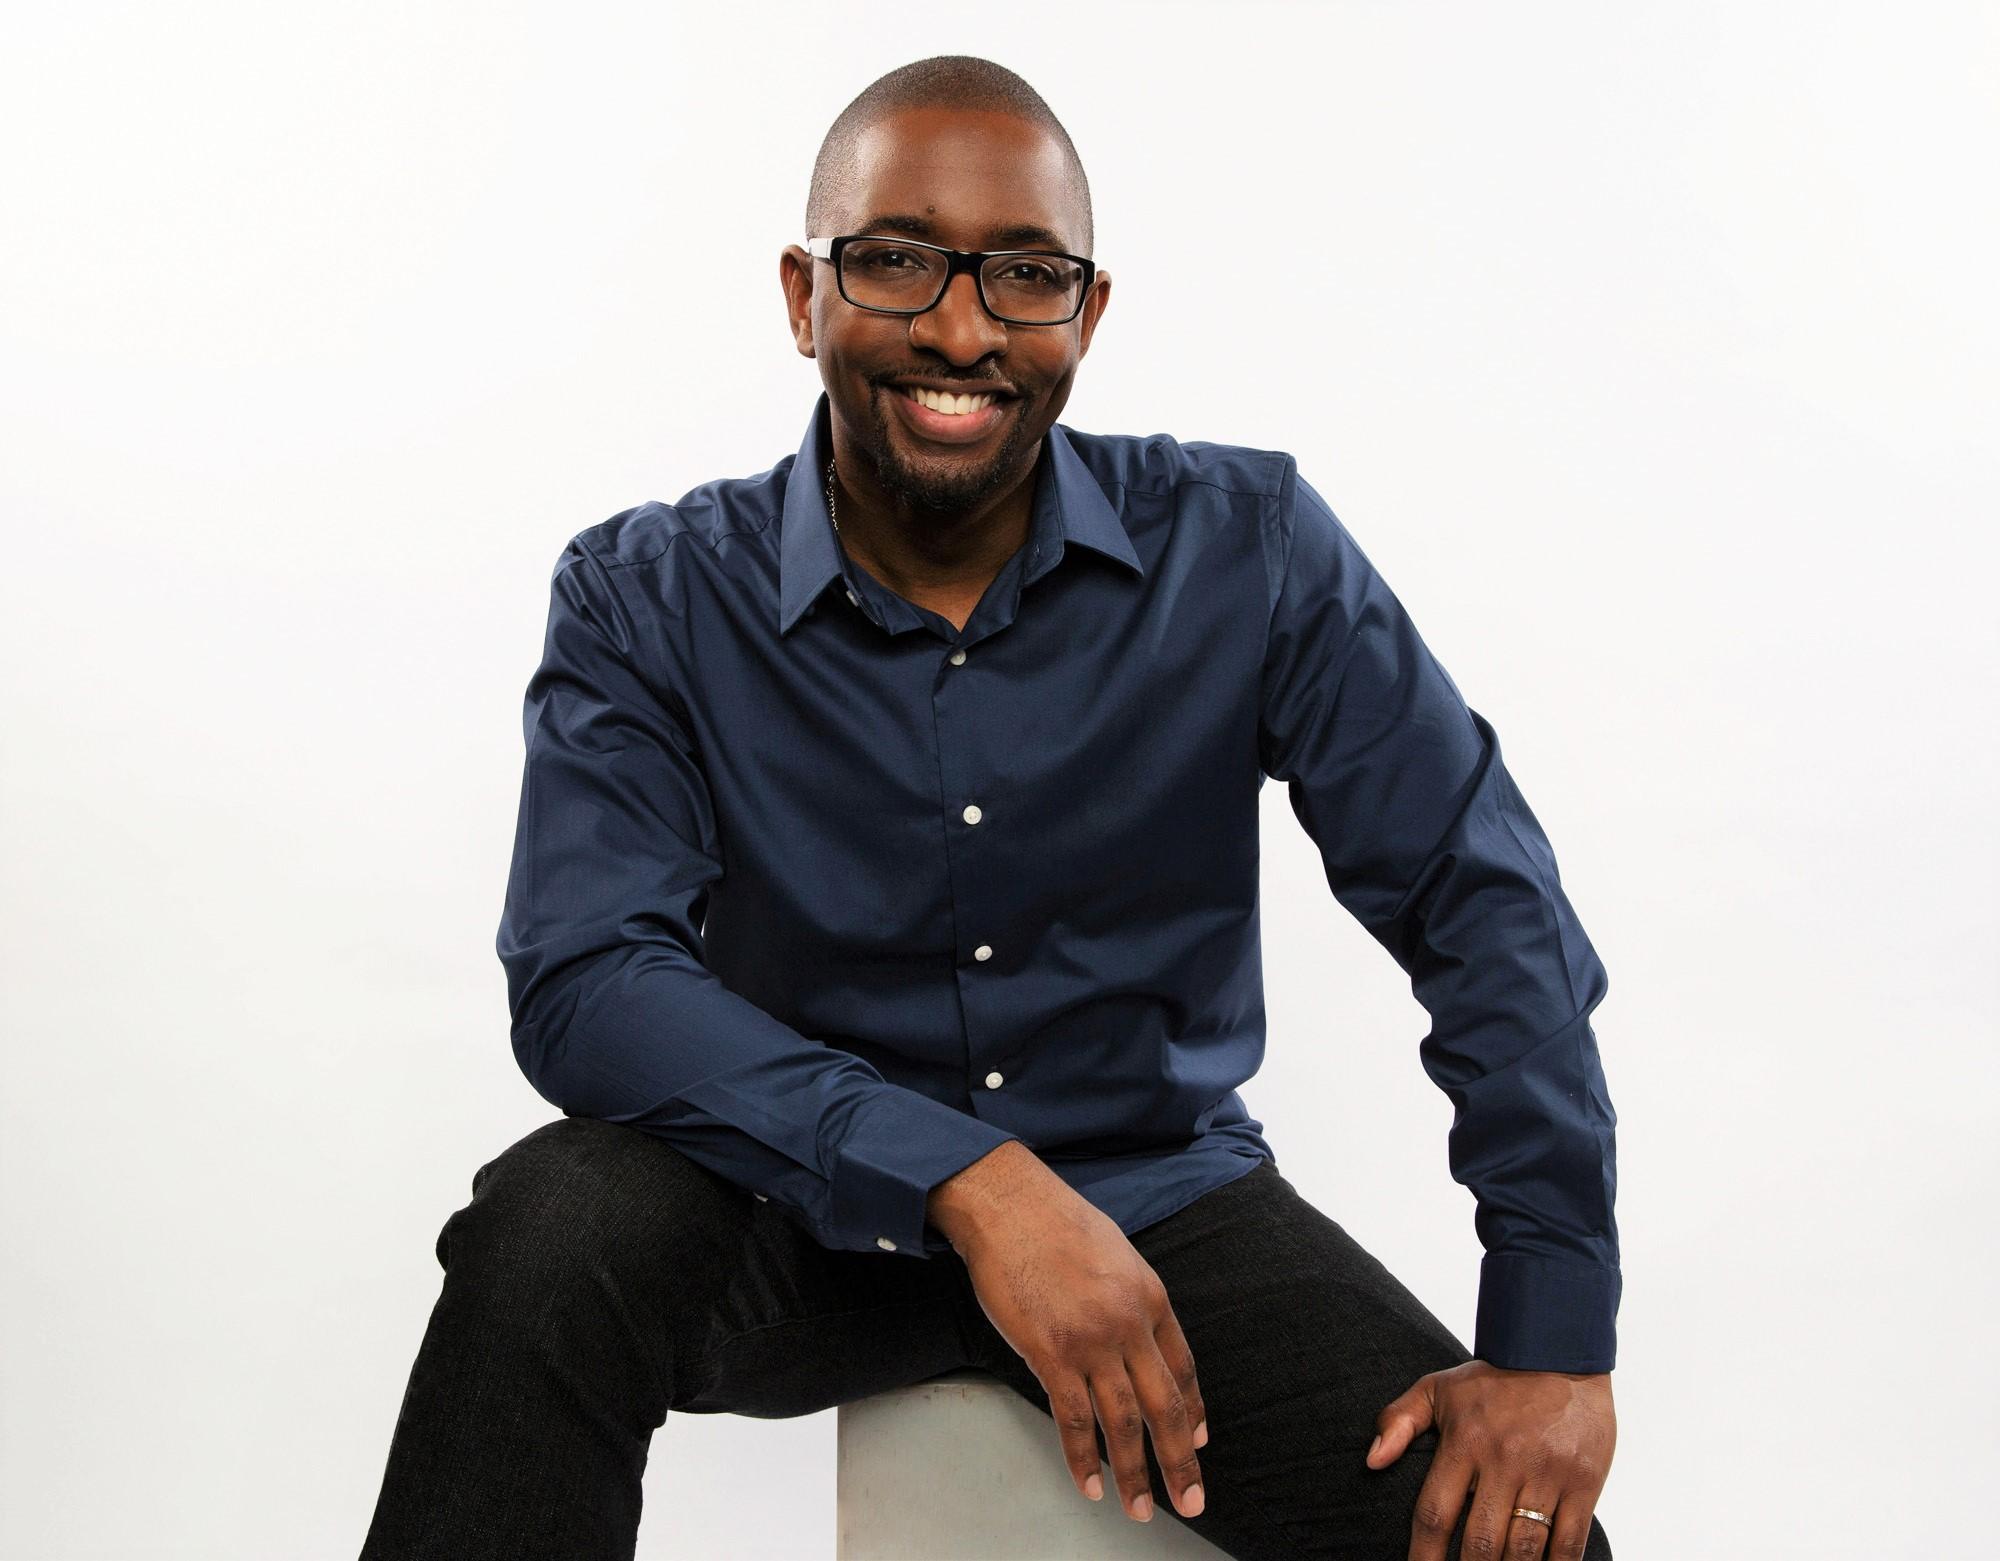 Jared KF Jones - Creator of The Song Scope - Songwriter, Producer, Artist